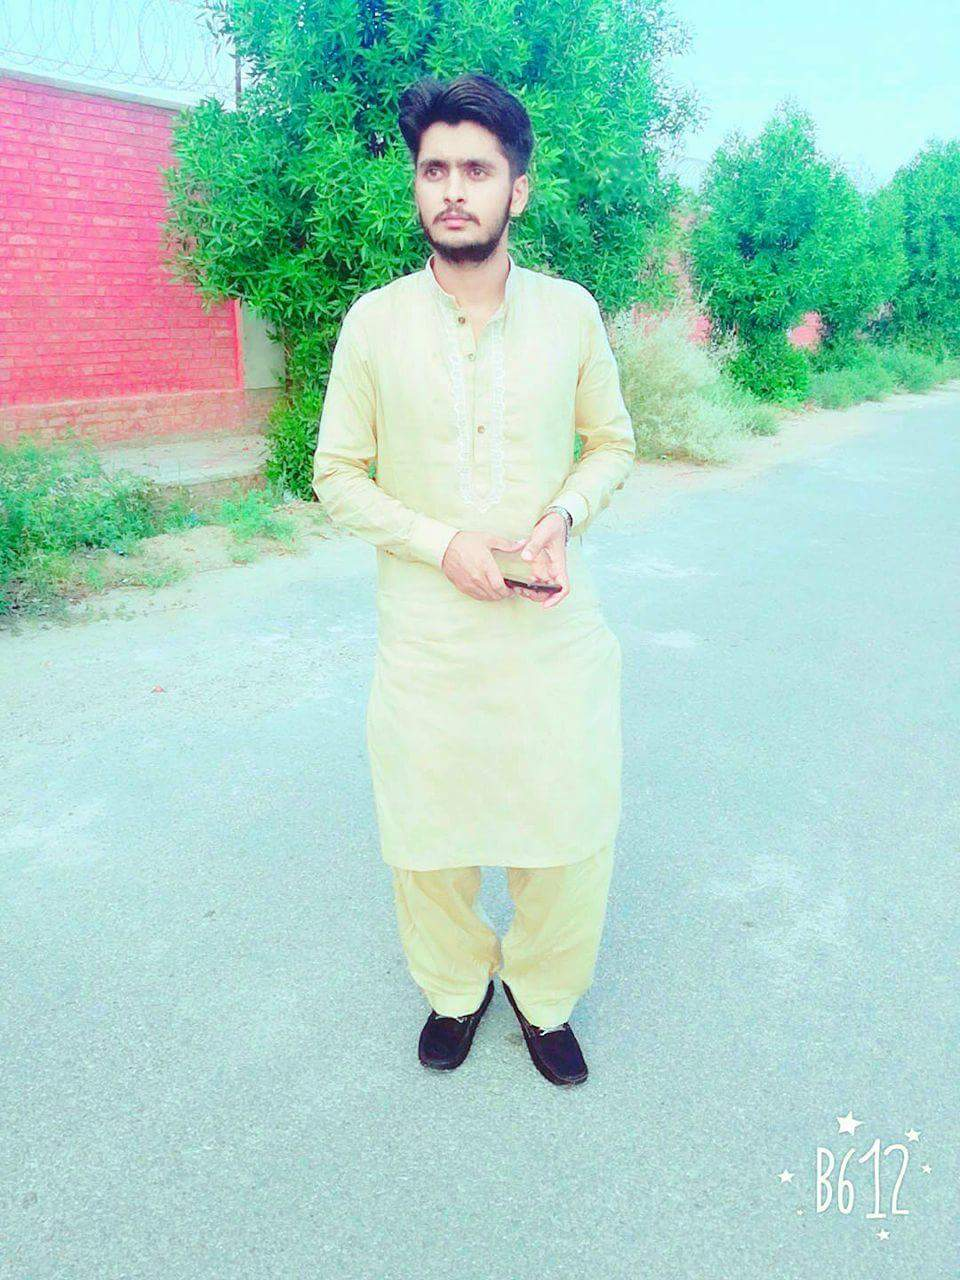 Abdul Hannan Sarwar Fashion Modeling, Engineering, Logistics & Shipping, Punjabi, Urdu